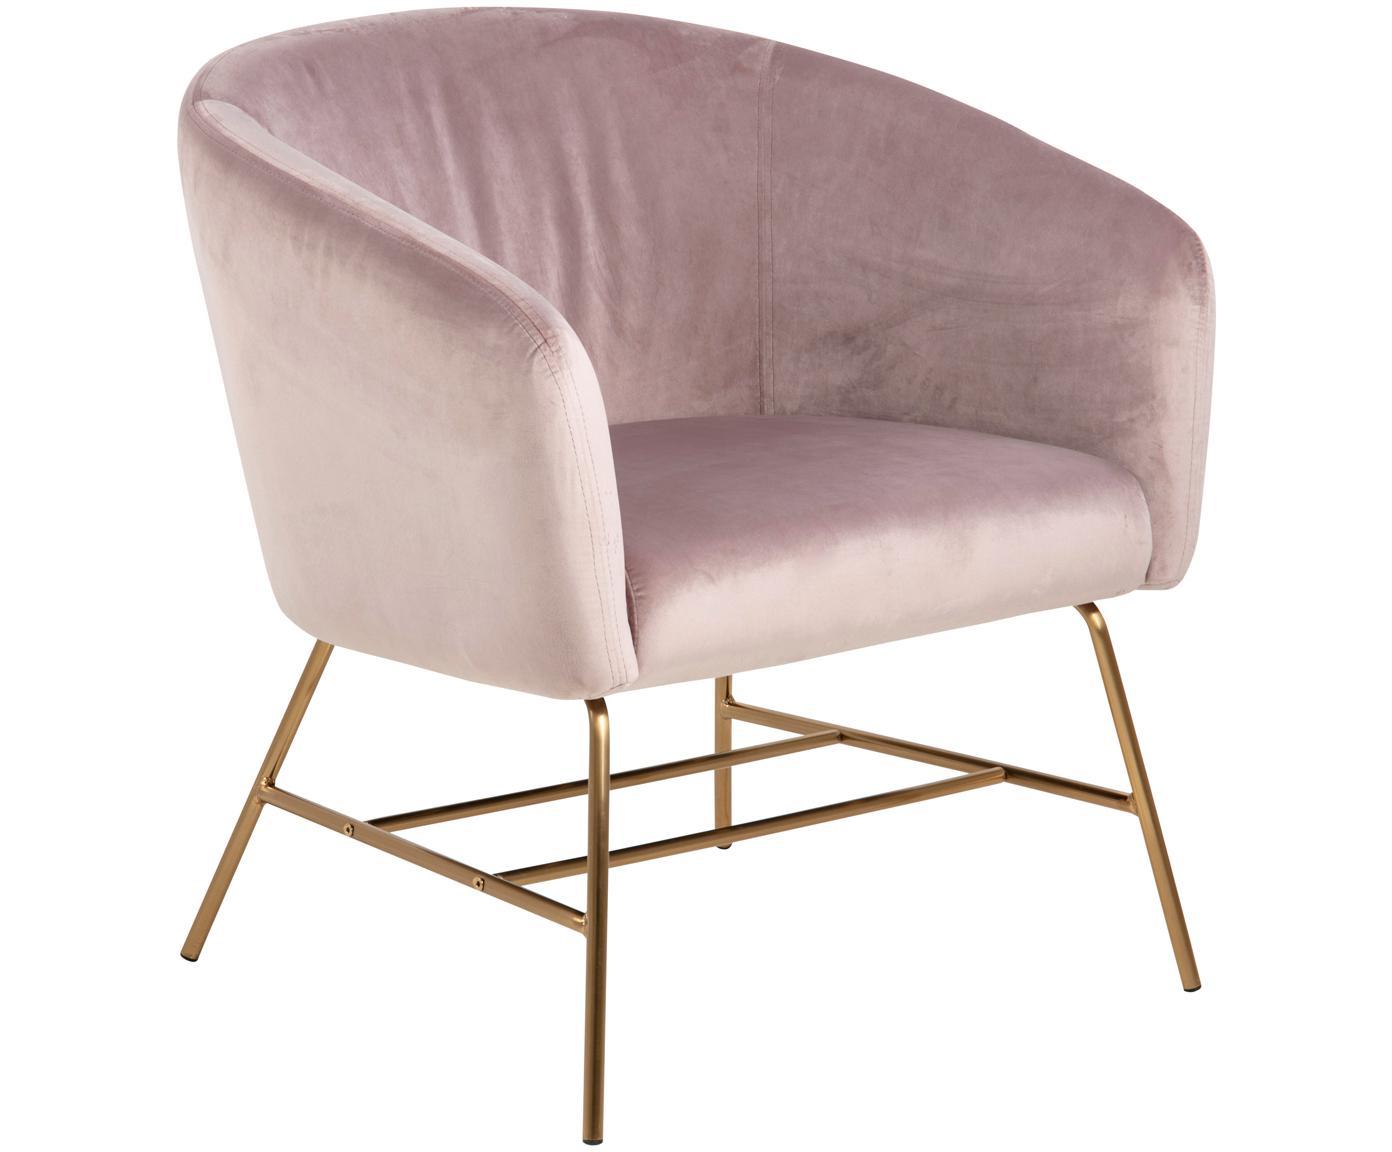 Moderne fluwelen fauteuil Ramsey in roze, Bekleding: polyester fluweel, Poten: gelakt metaal, Roze, messingkleurig, B 72 x D 67 cm